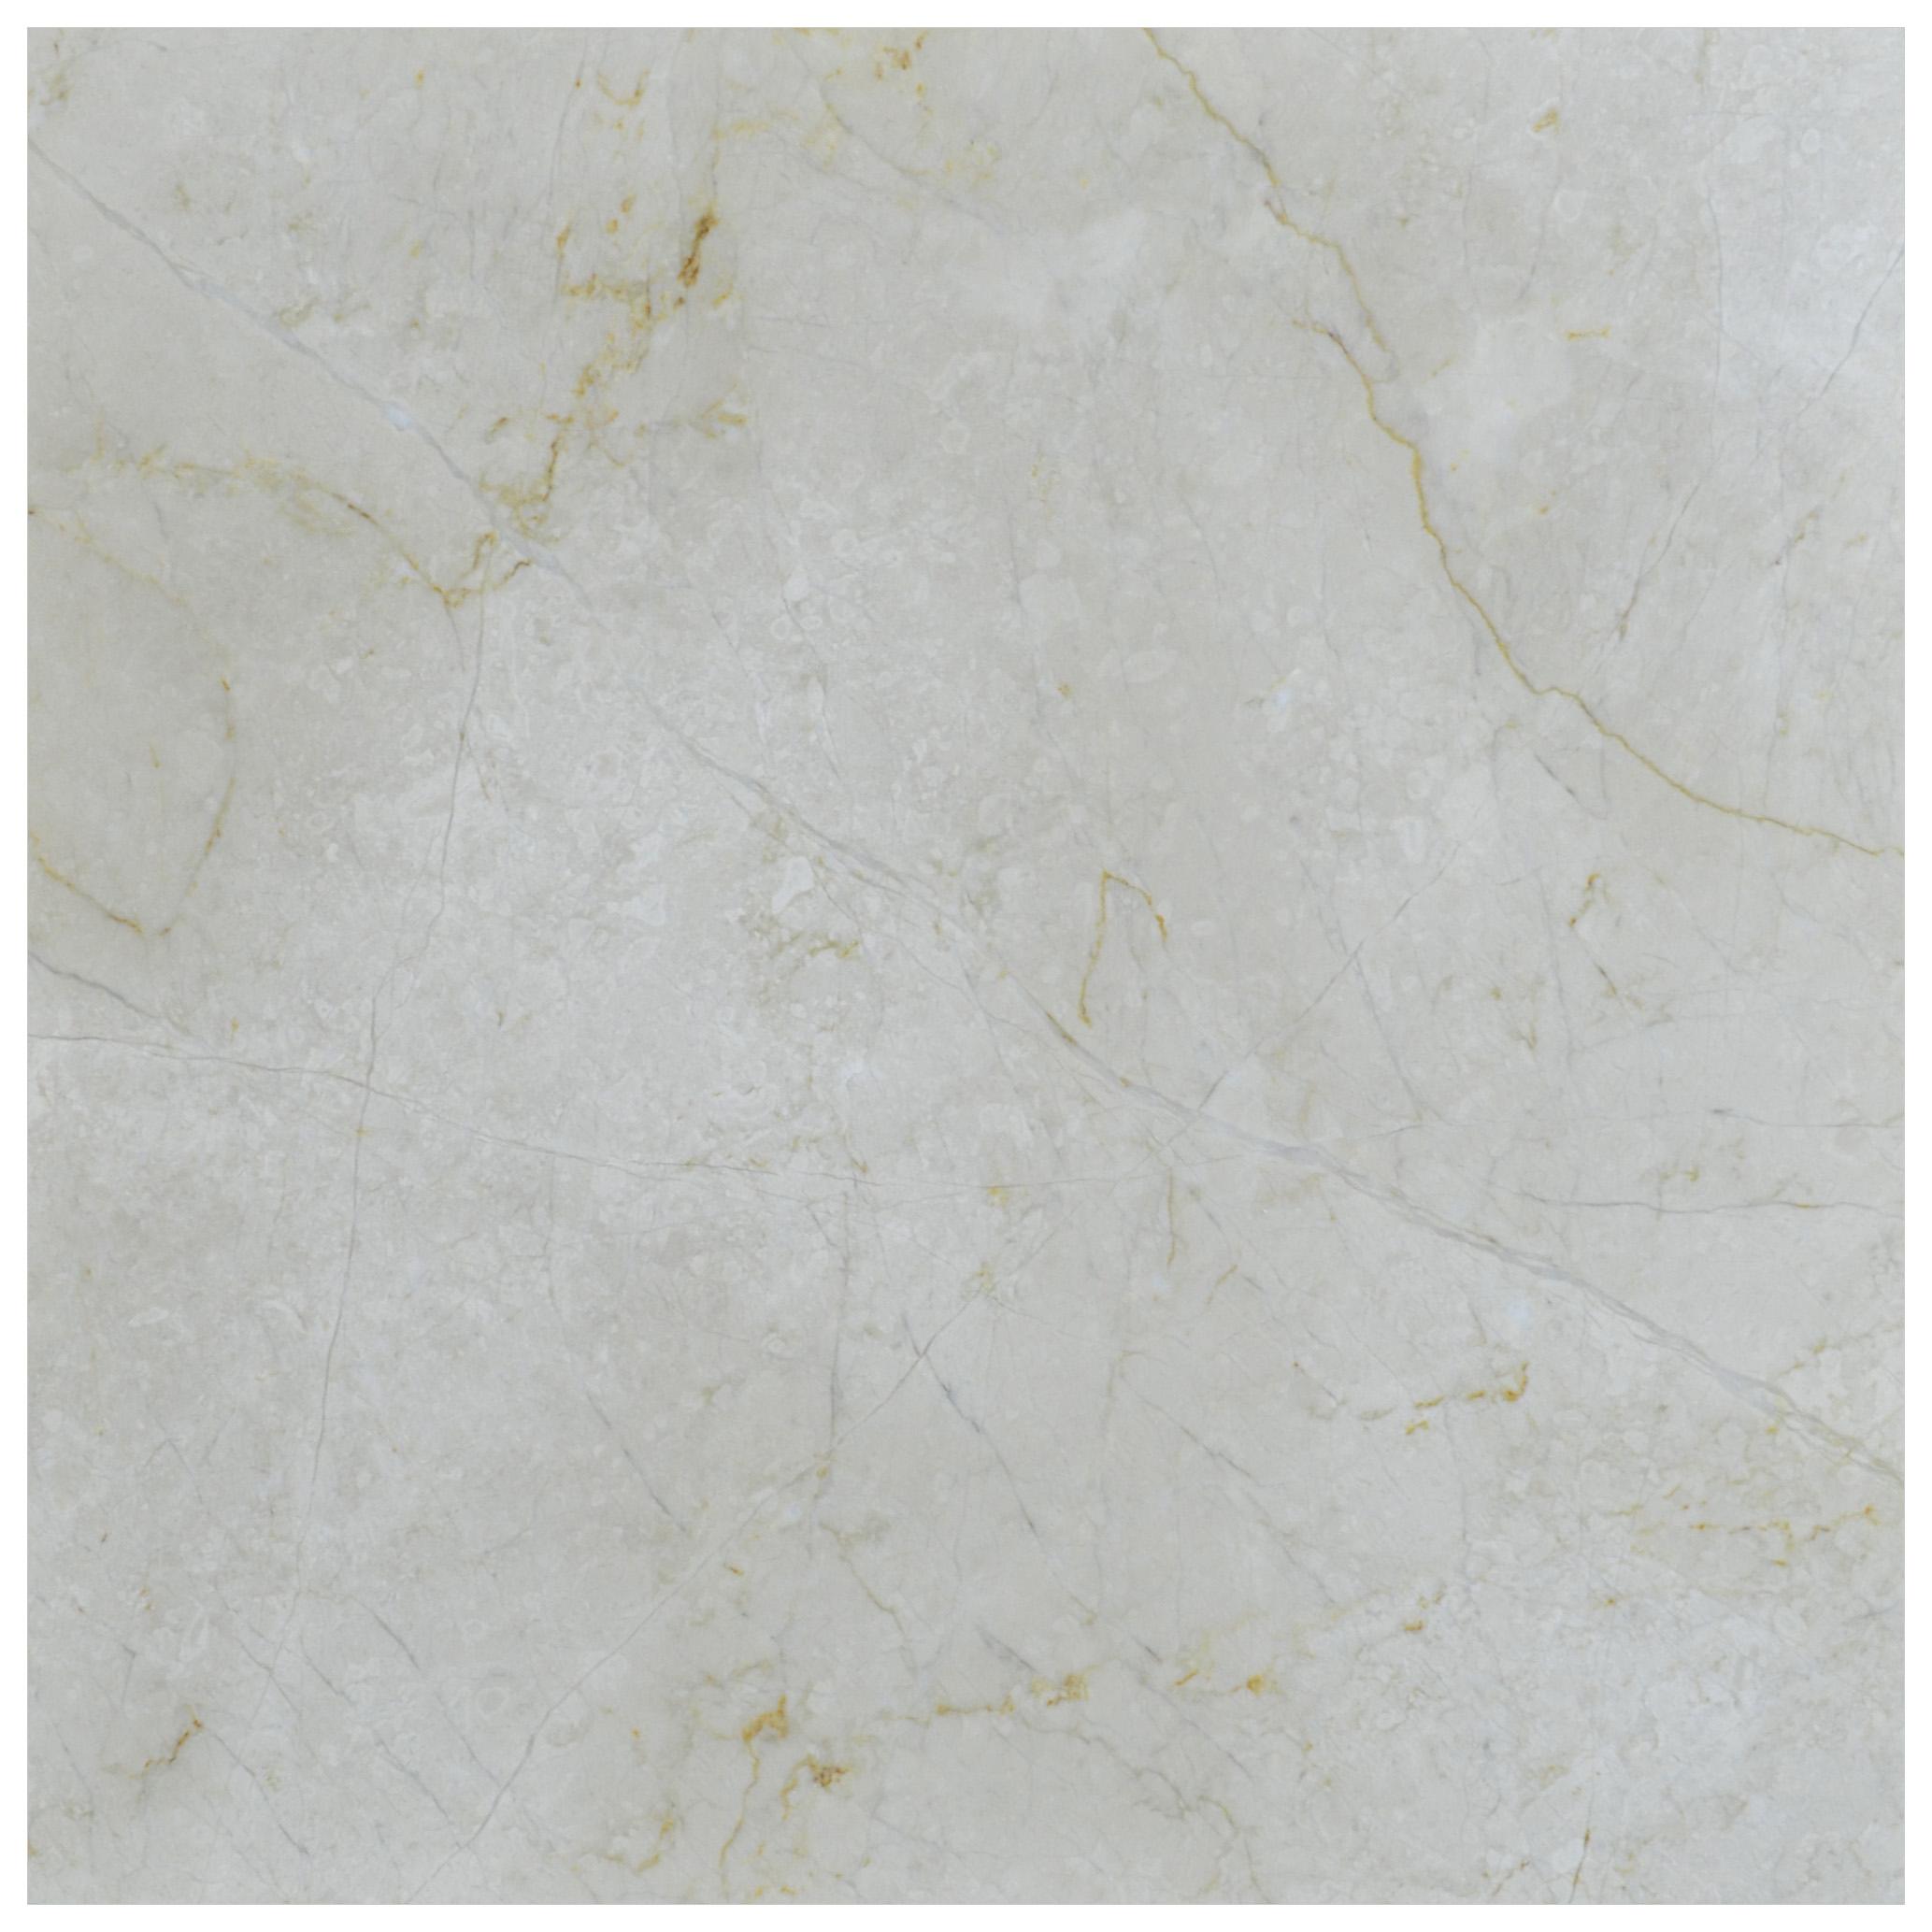 Cream Nouva Antique Polished Marble Tiles 24x24-marble sale-Atlantic Stone Source